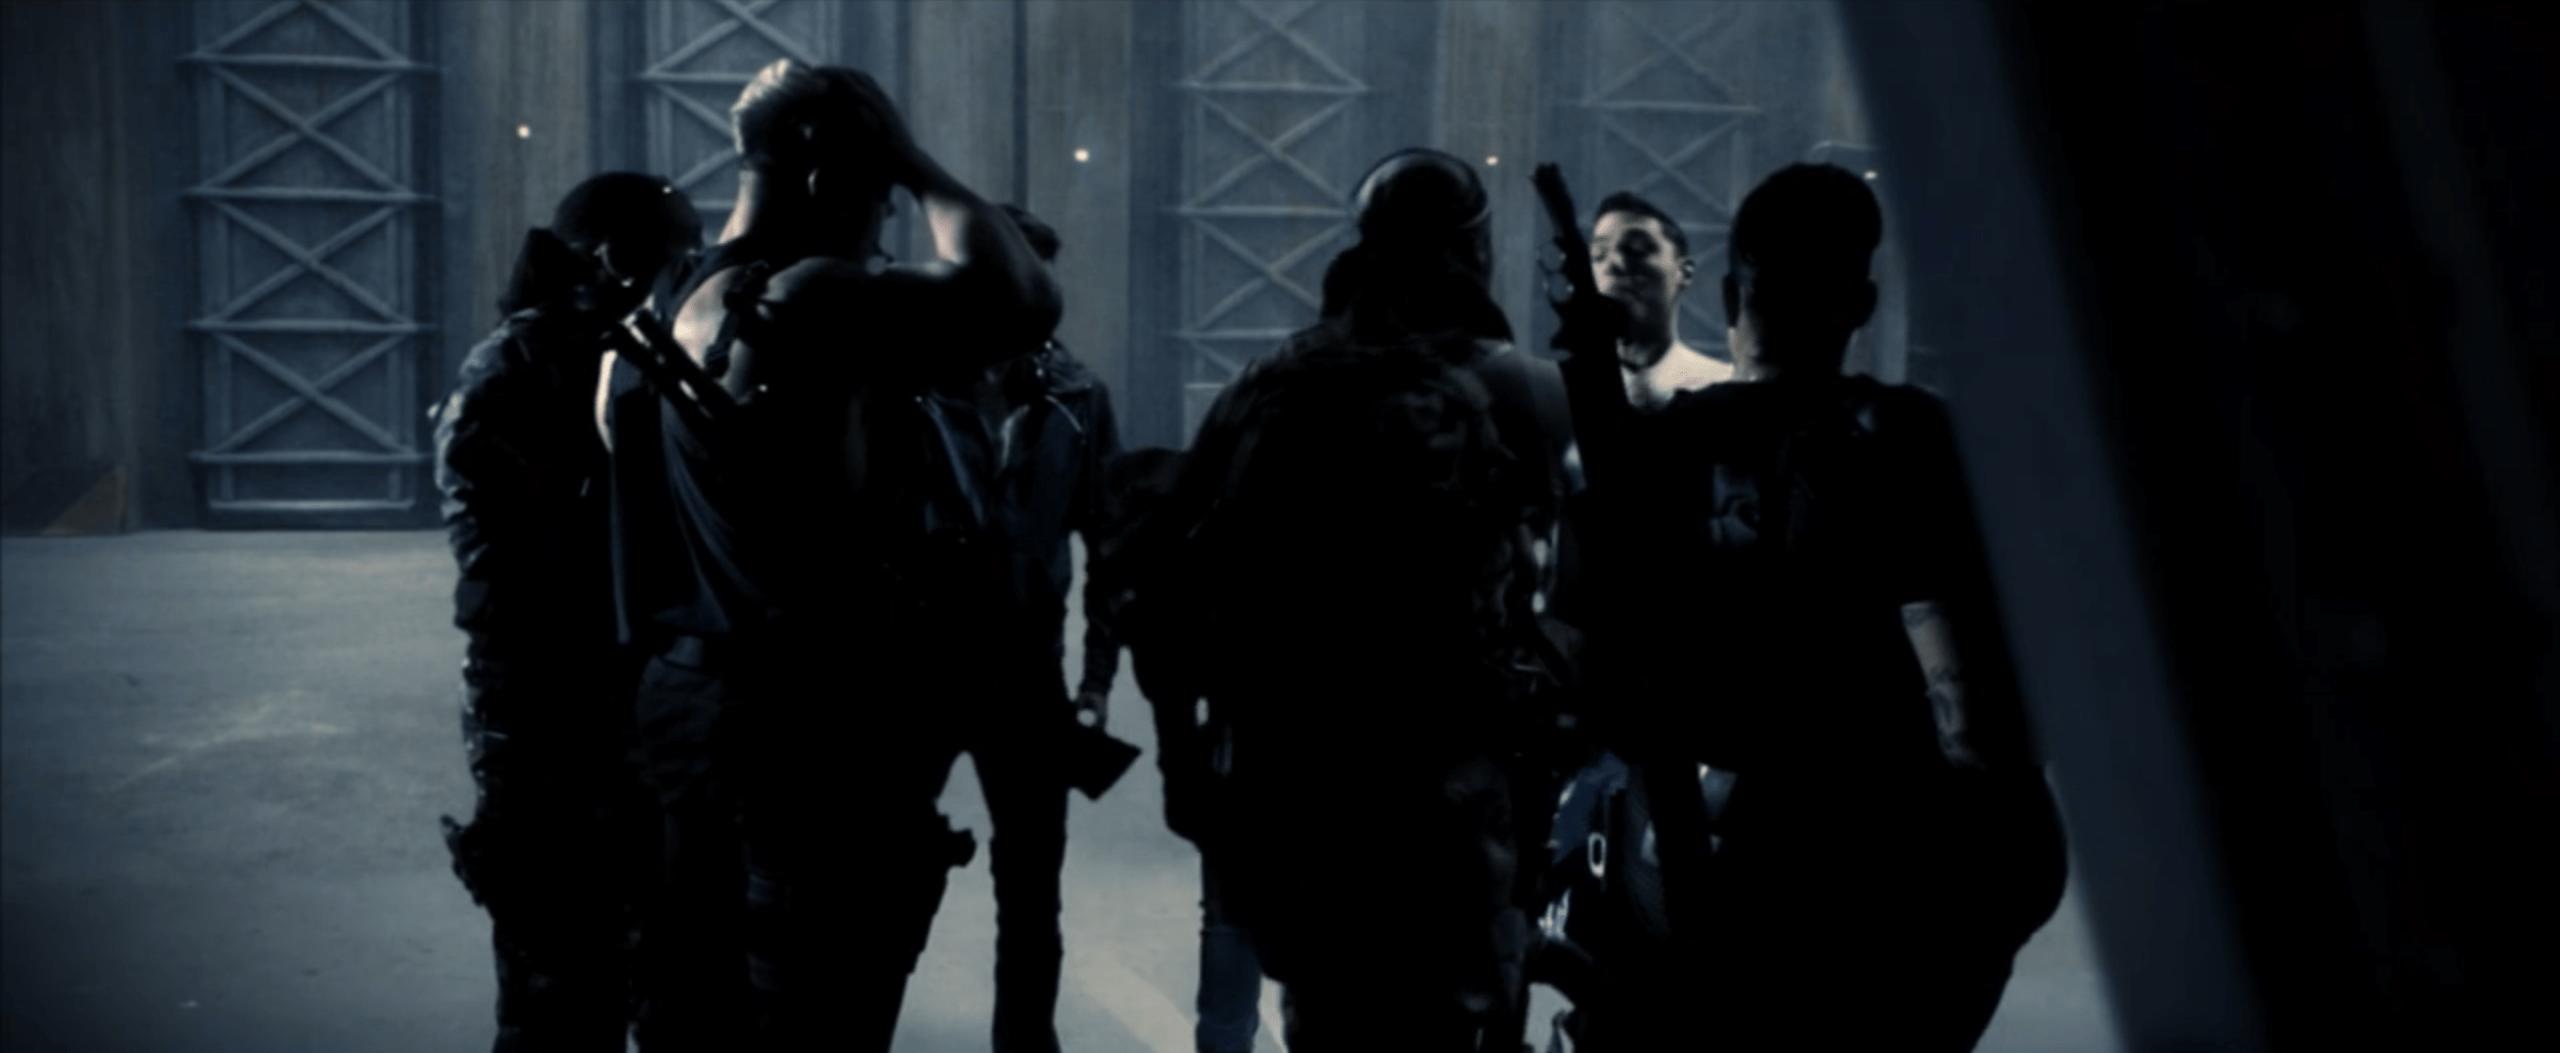 An awkward shot of the main characters